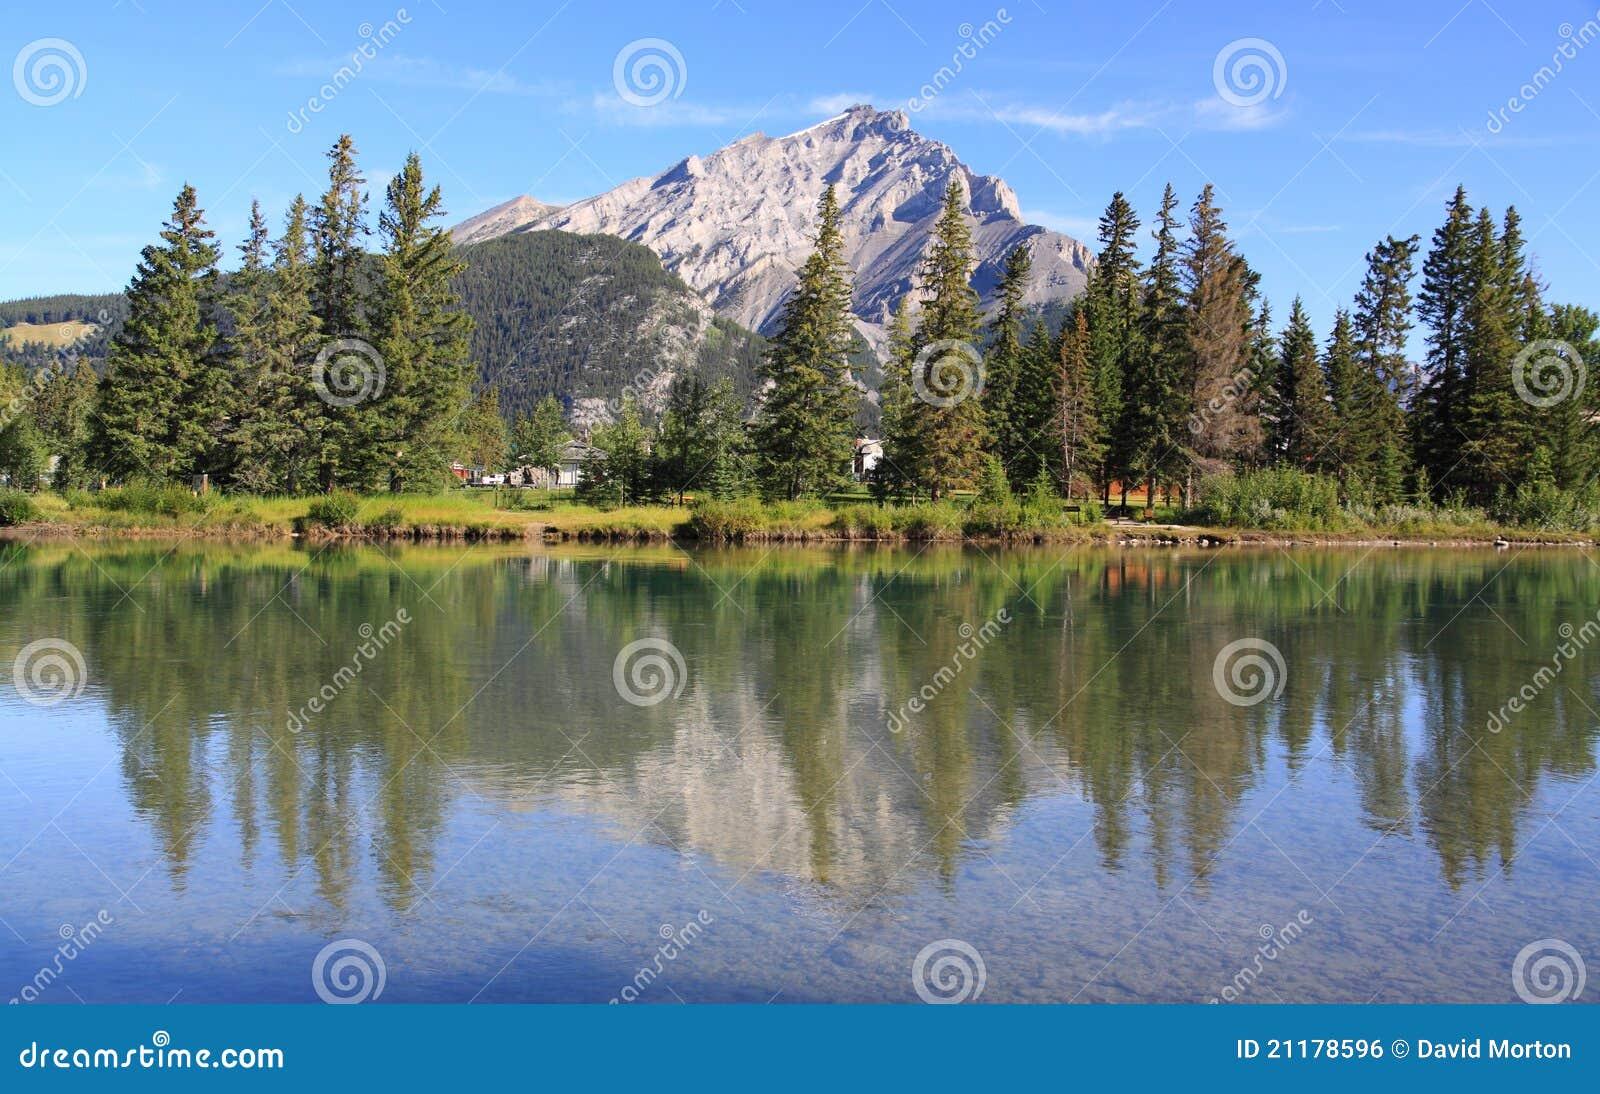 Banff - river bow